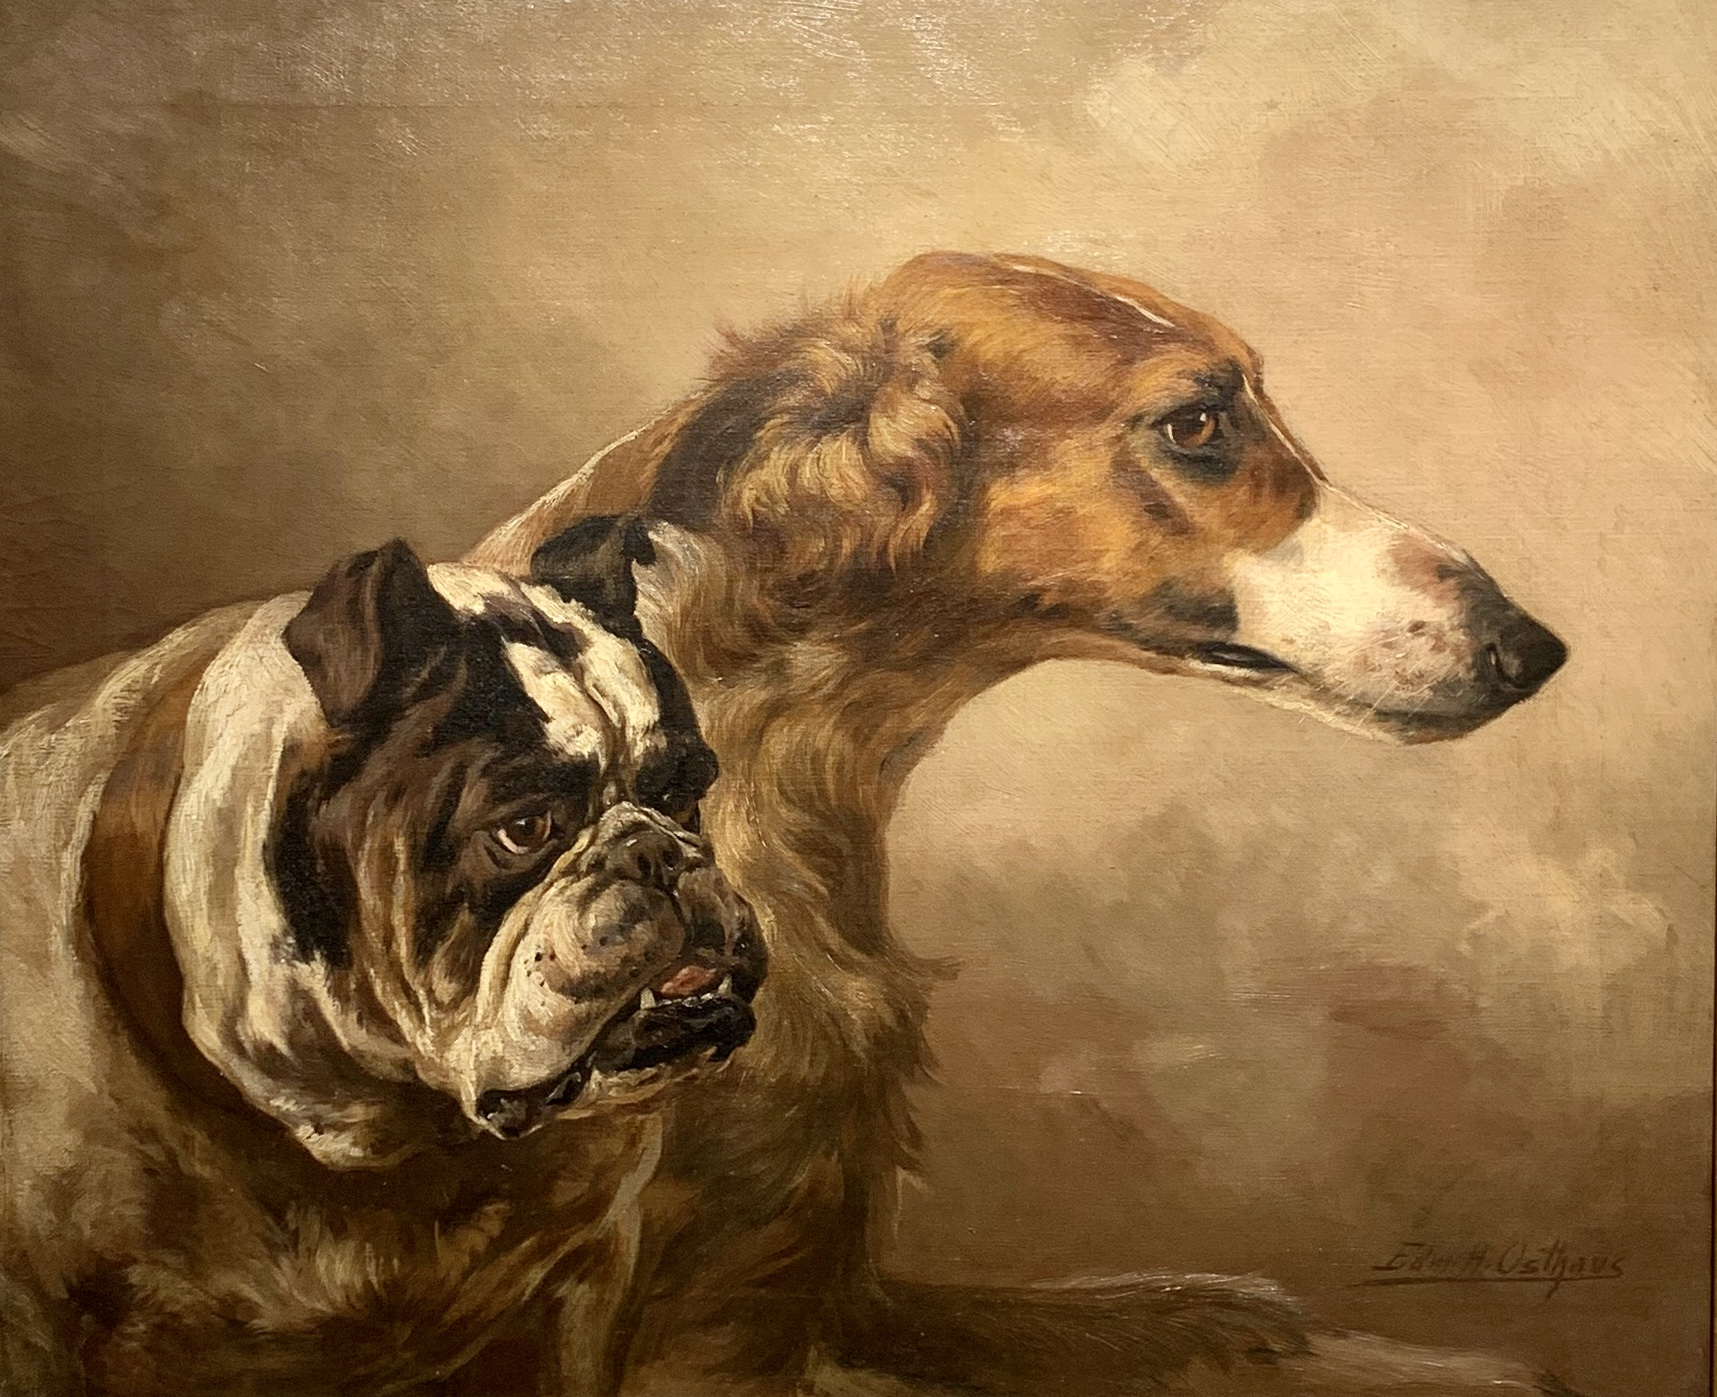 osthaustwodogs